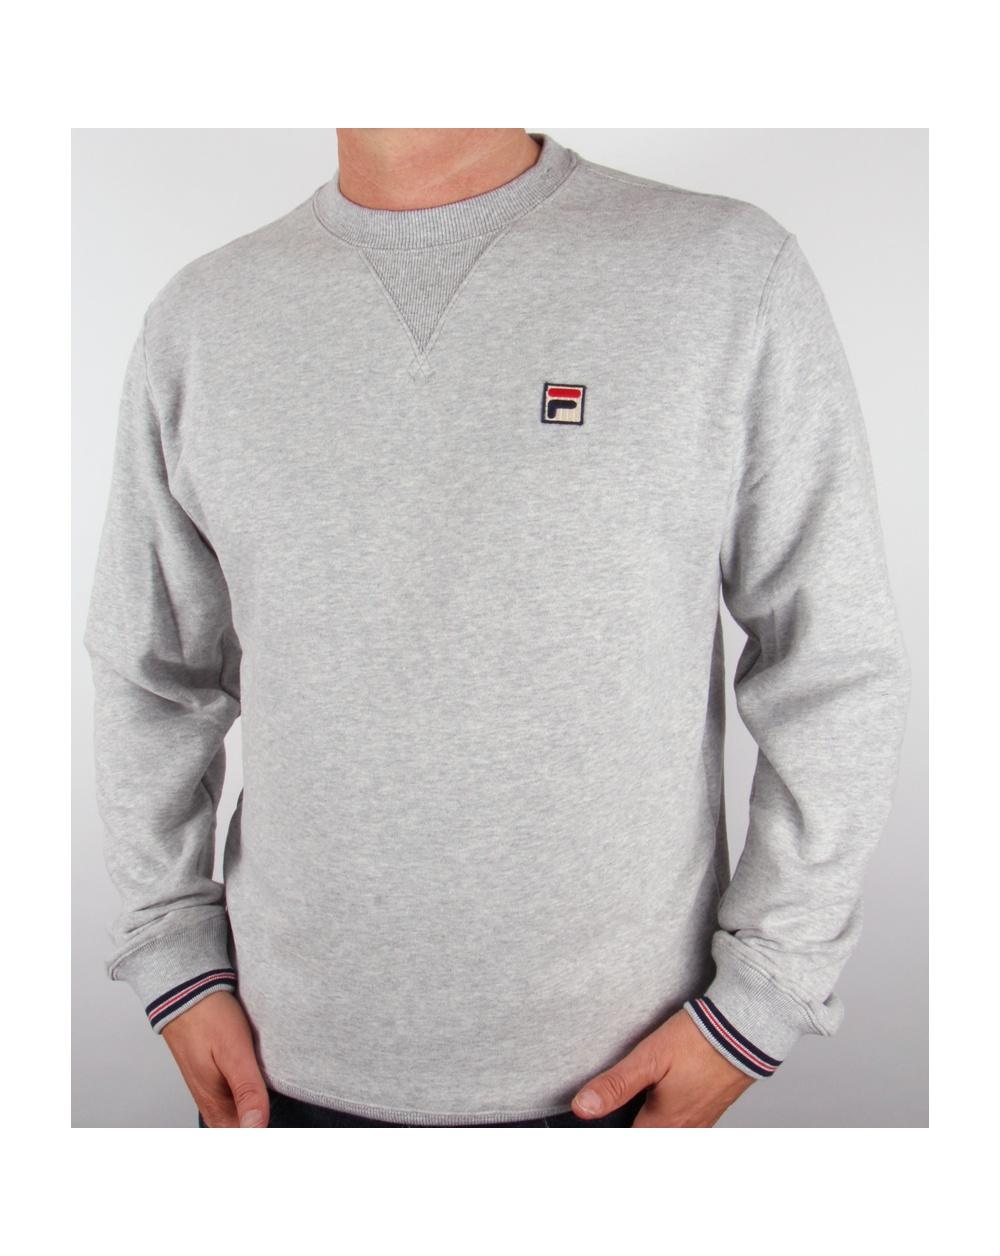 Grey Sweater Mens